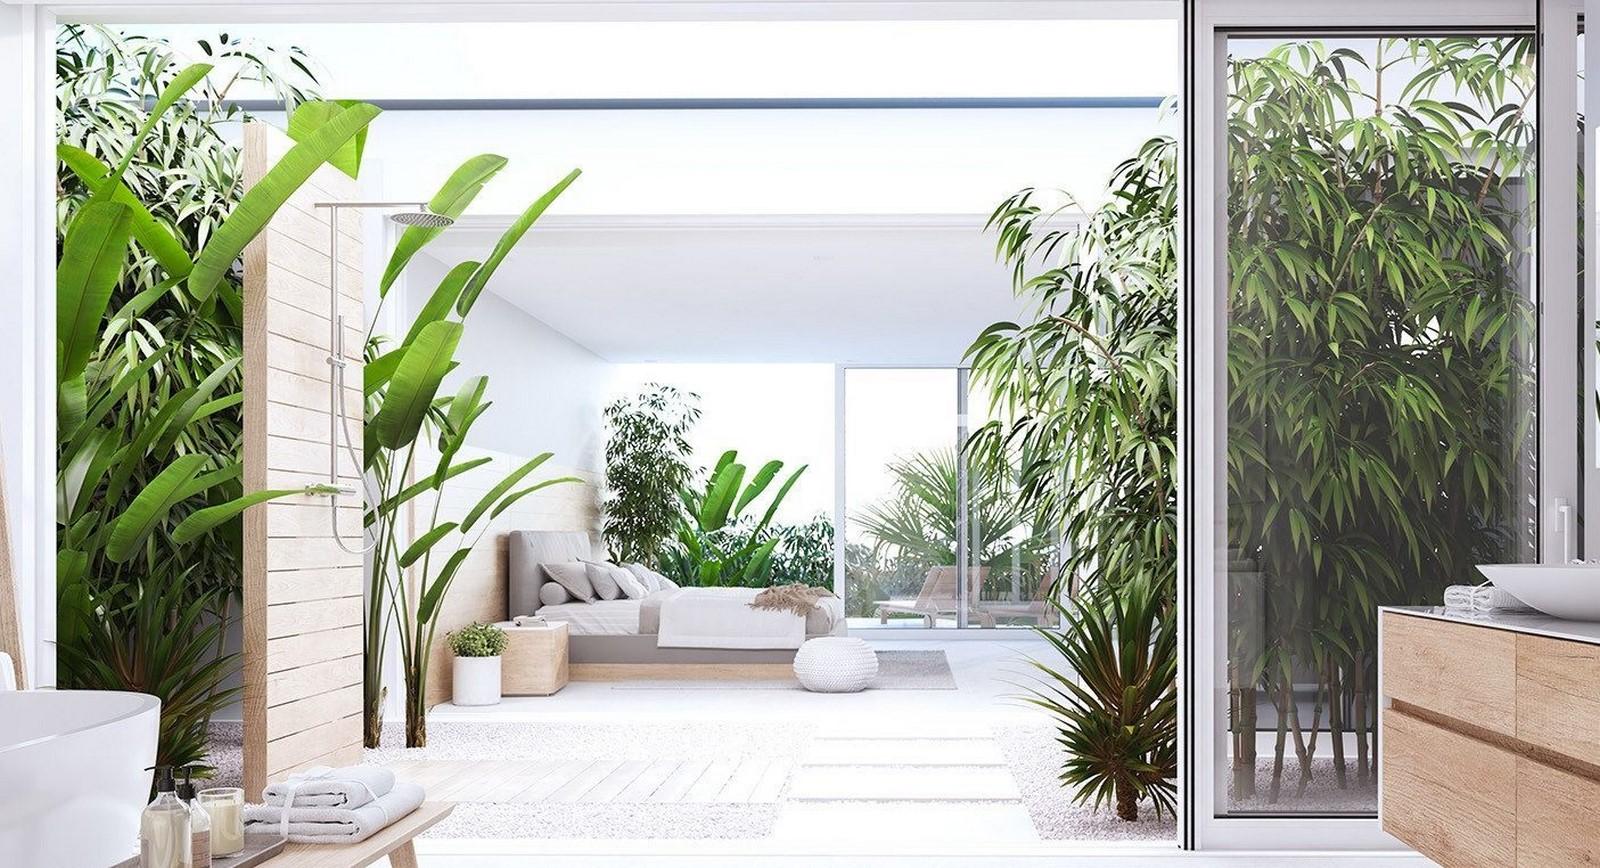 20 Futuristic bedroom interior ideas - Sheet1